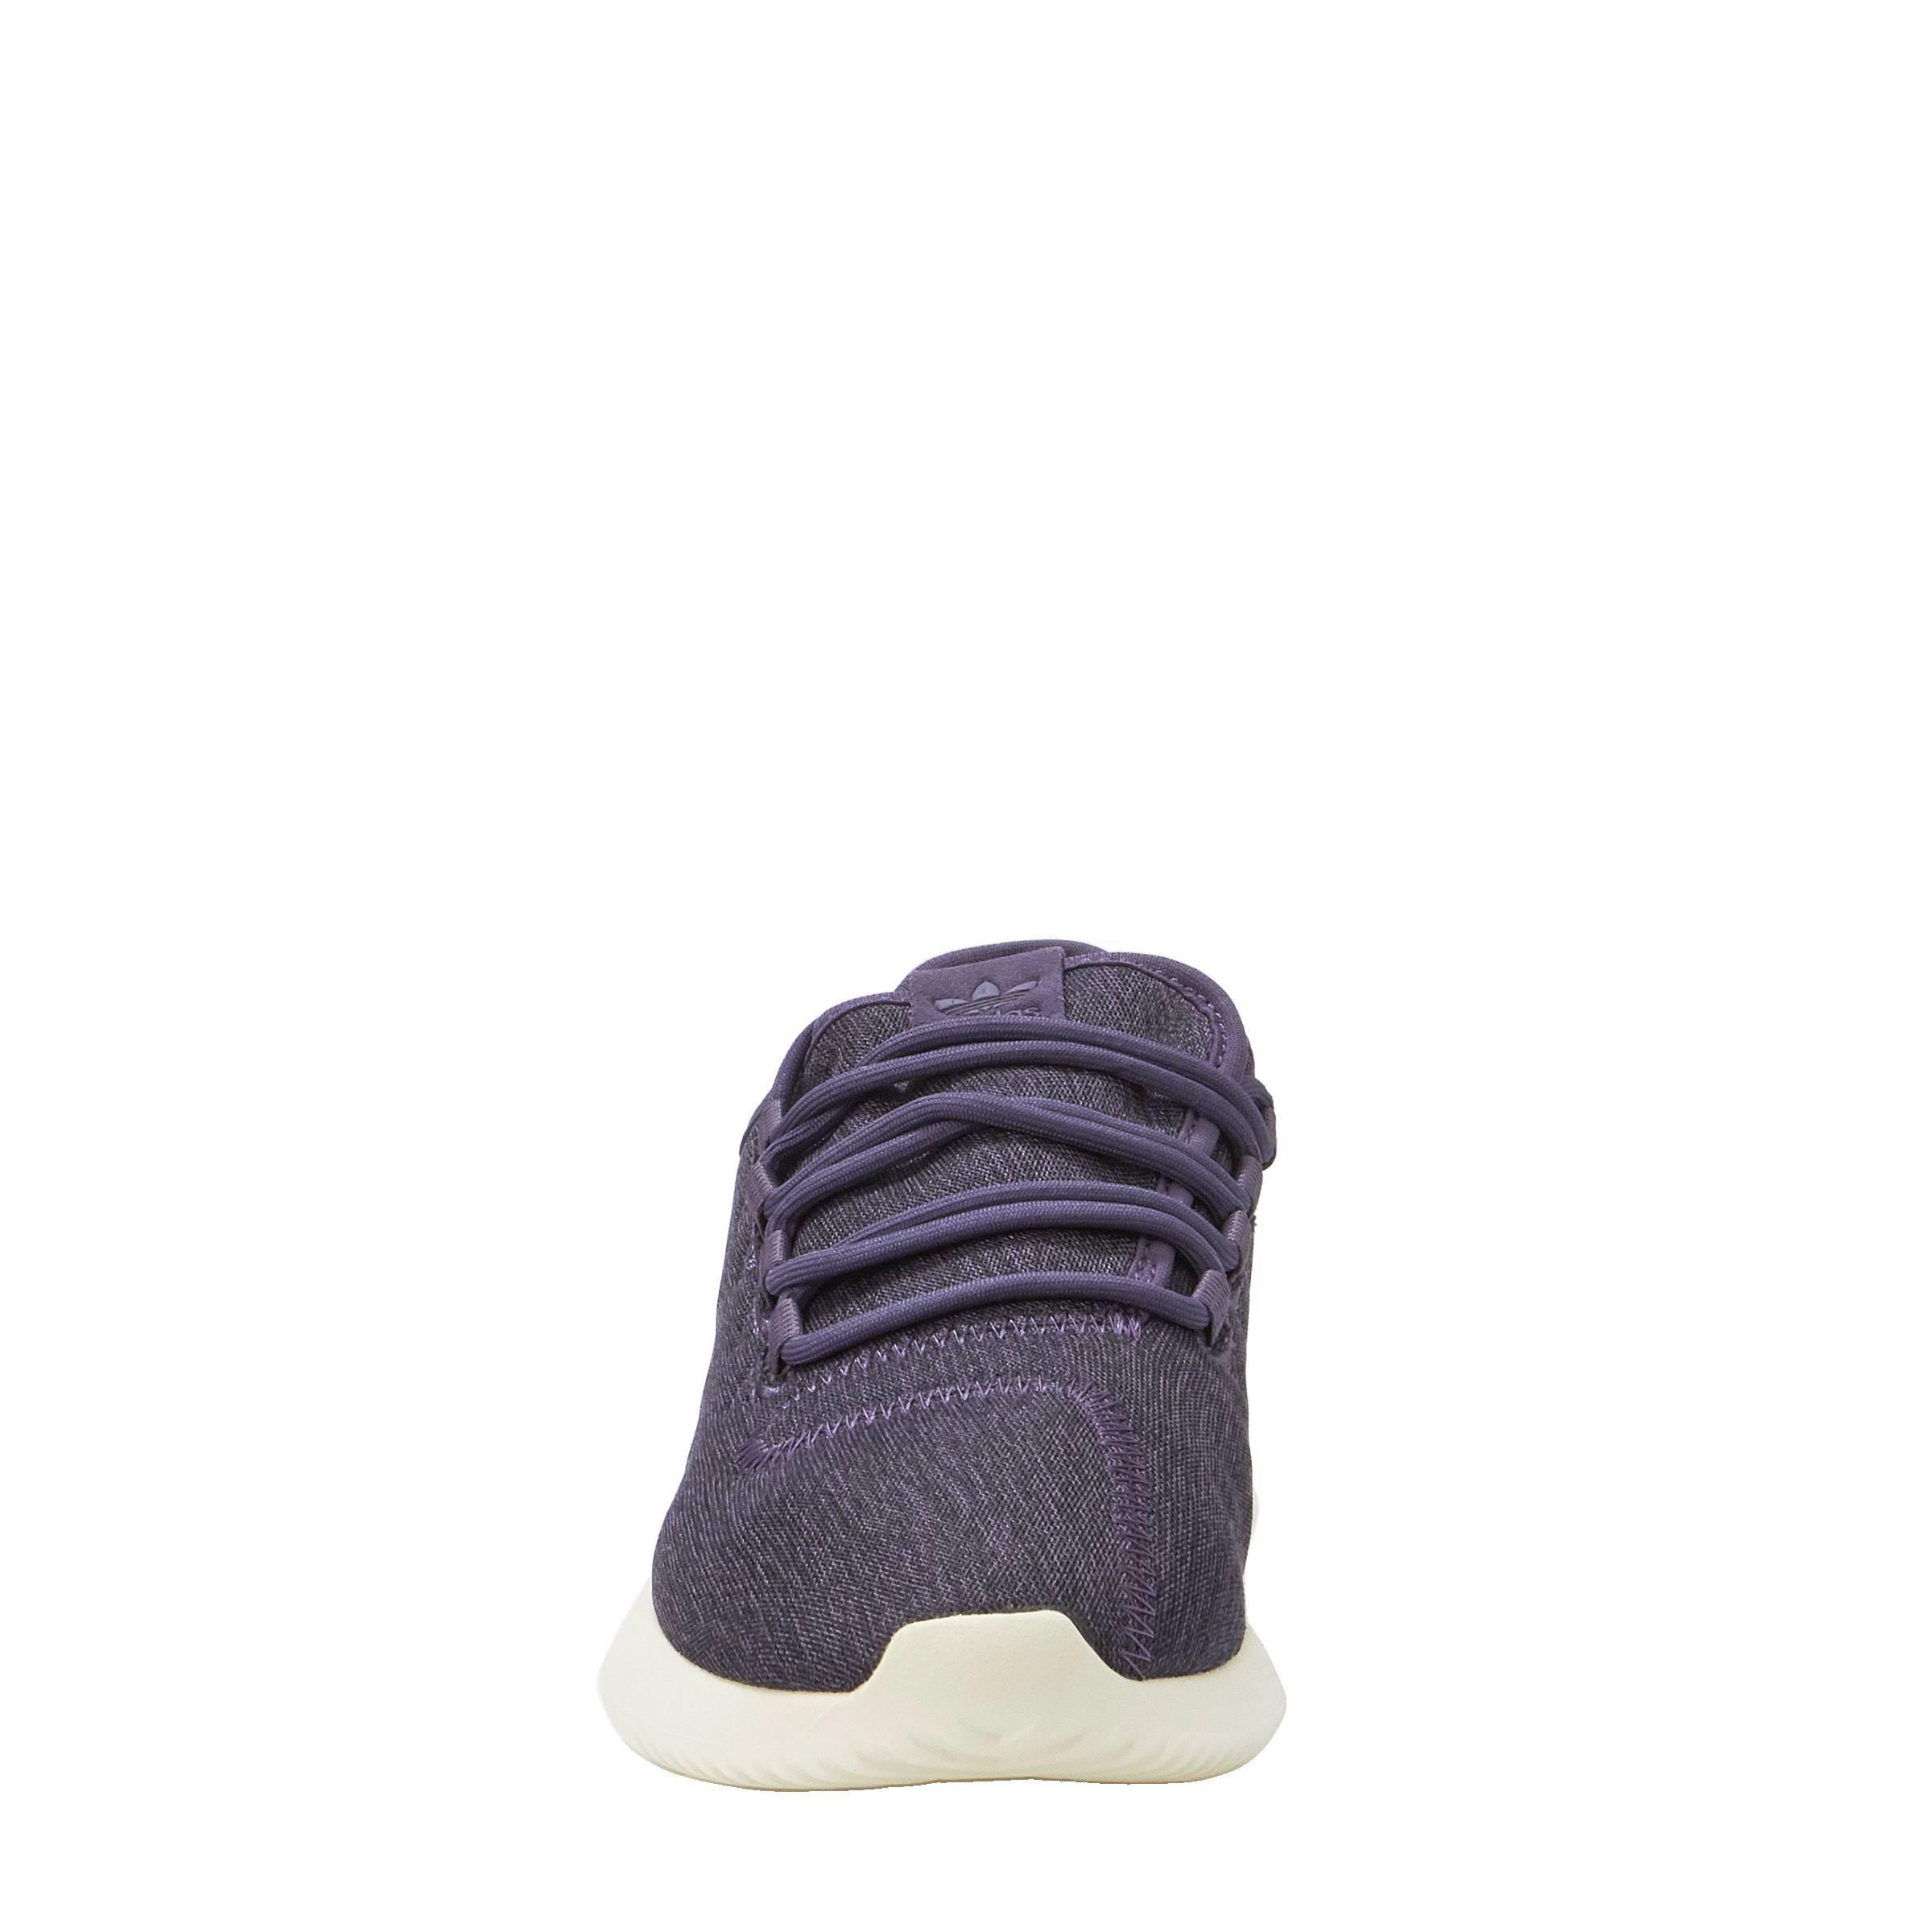 Tubular Shadow sneakers